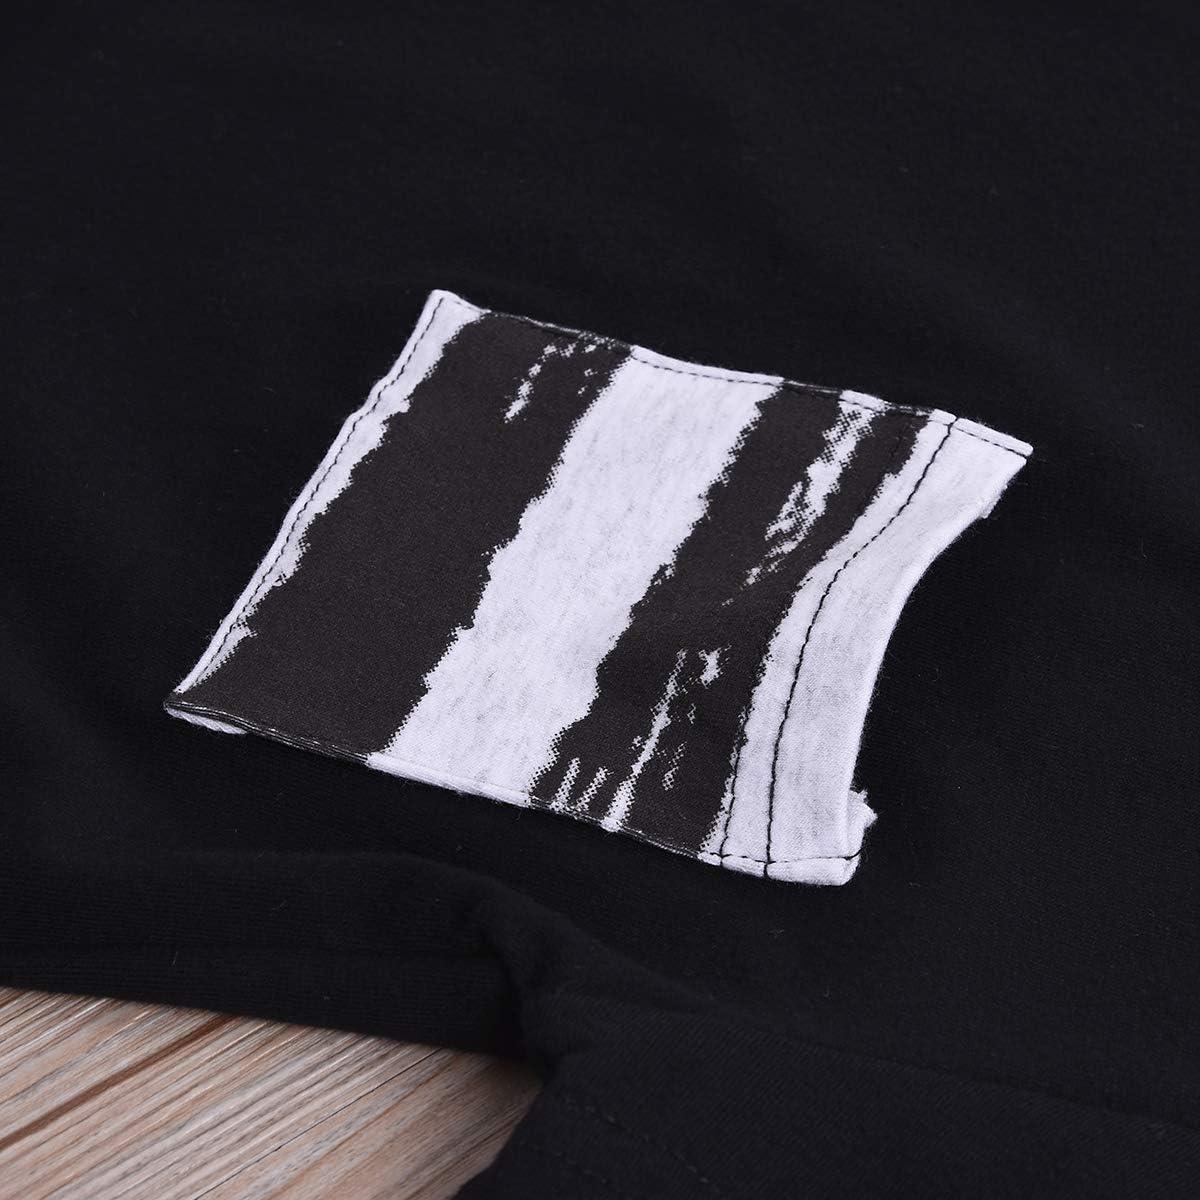 Infant Baby Boys Short Sleeve T-Shirt Top Stripes Shorts Summer Suit Playwear Sets 2Pcs